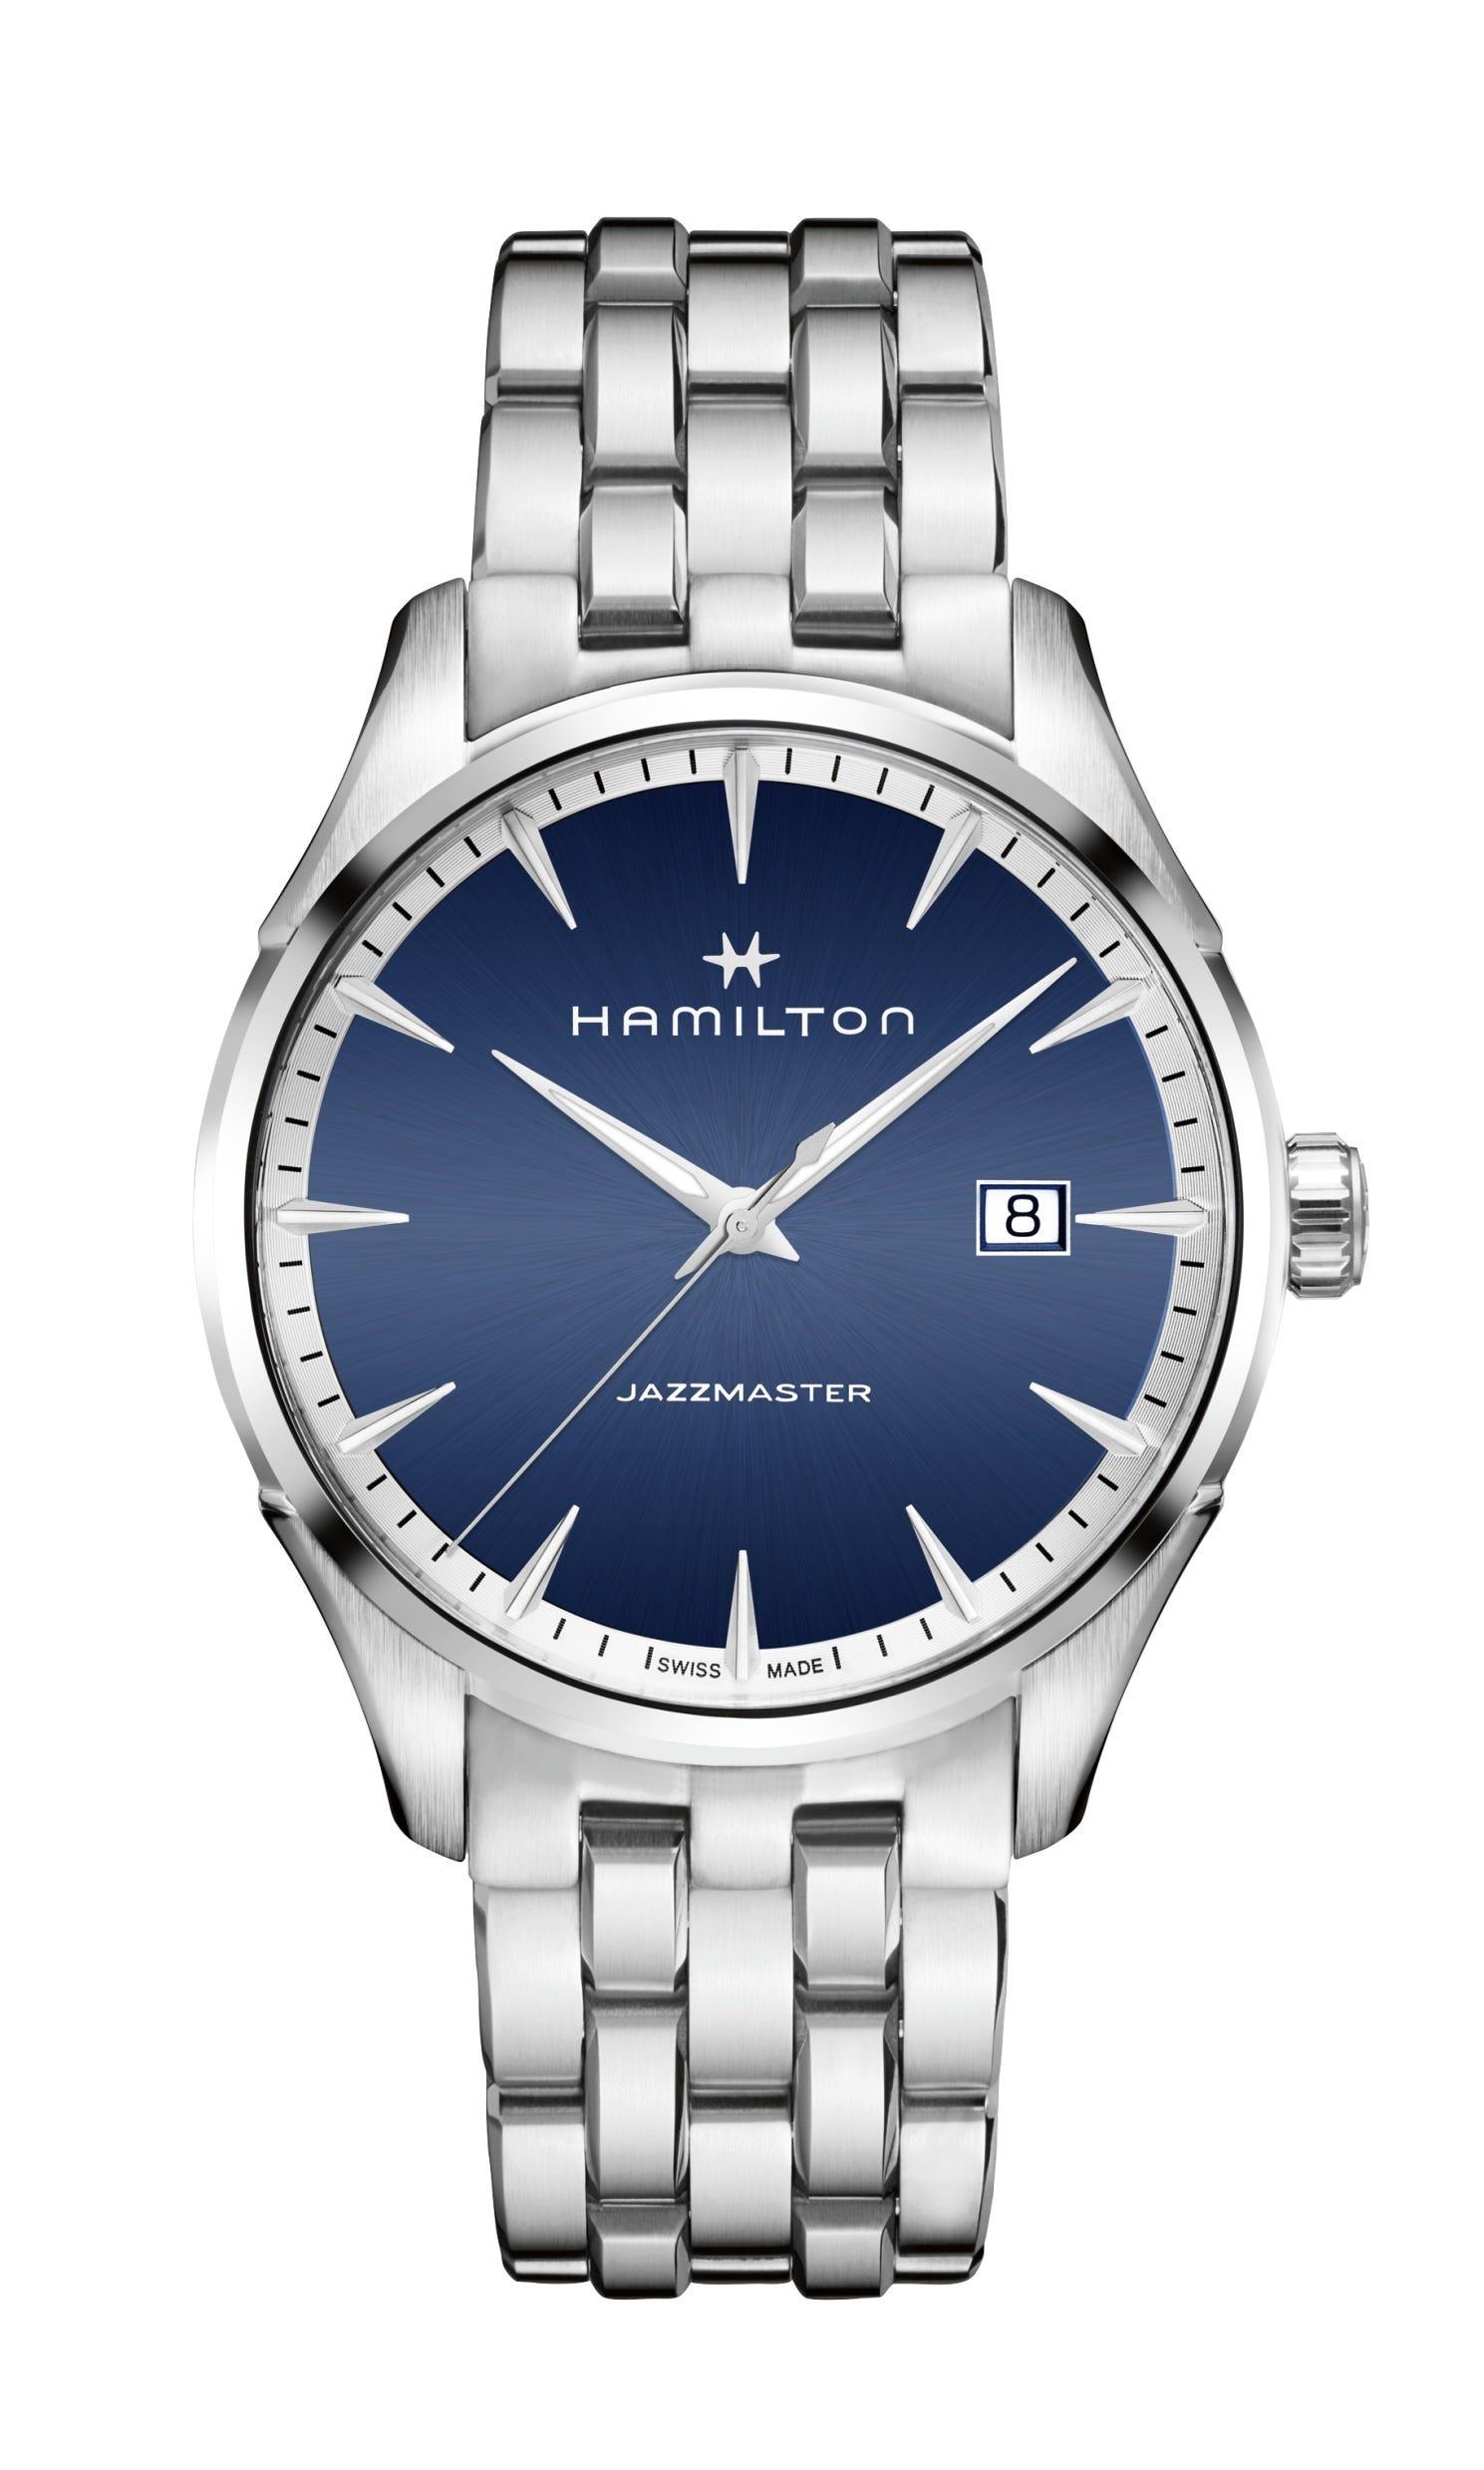 Hamilton Men's Jazzmaster Quartz Watch H32451141